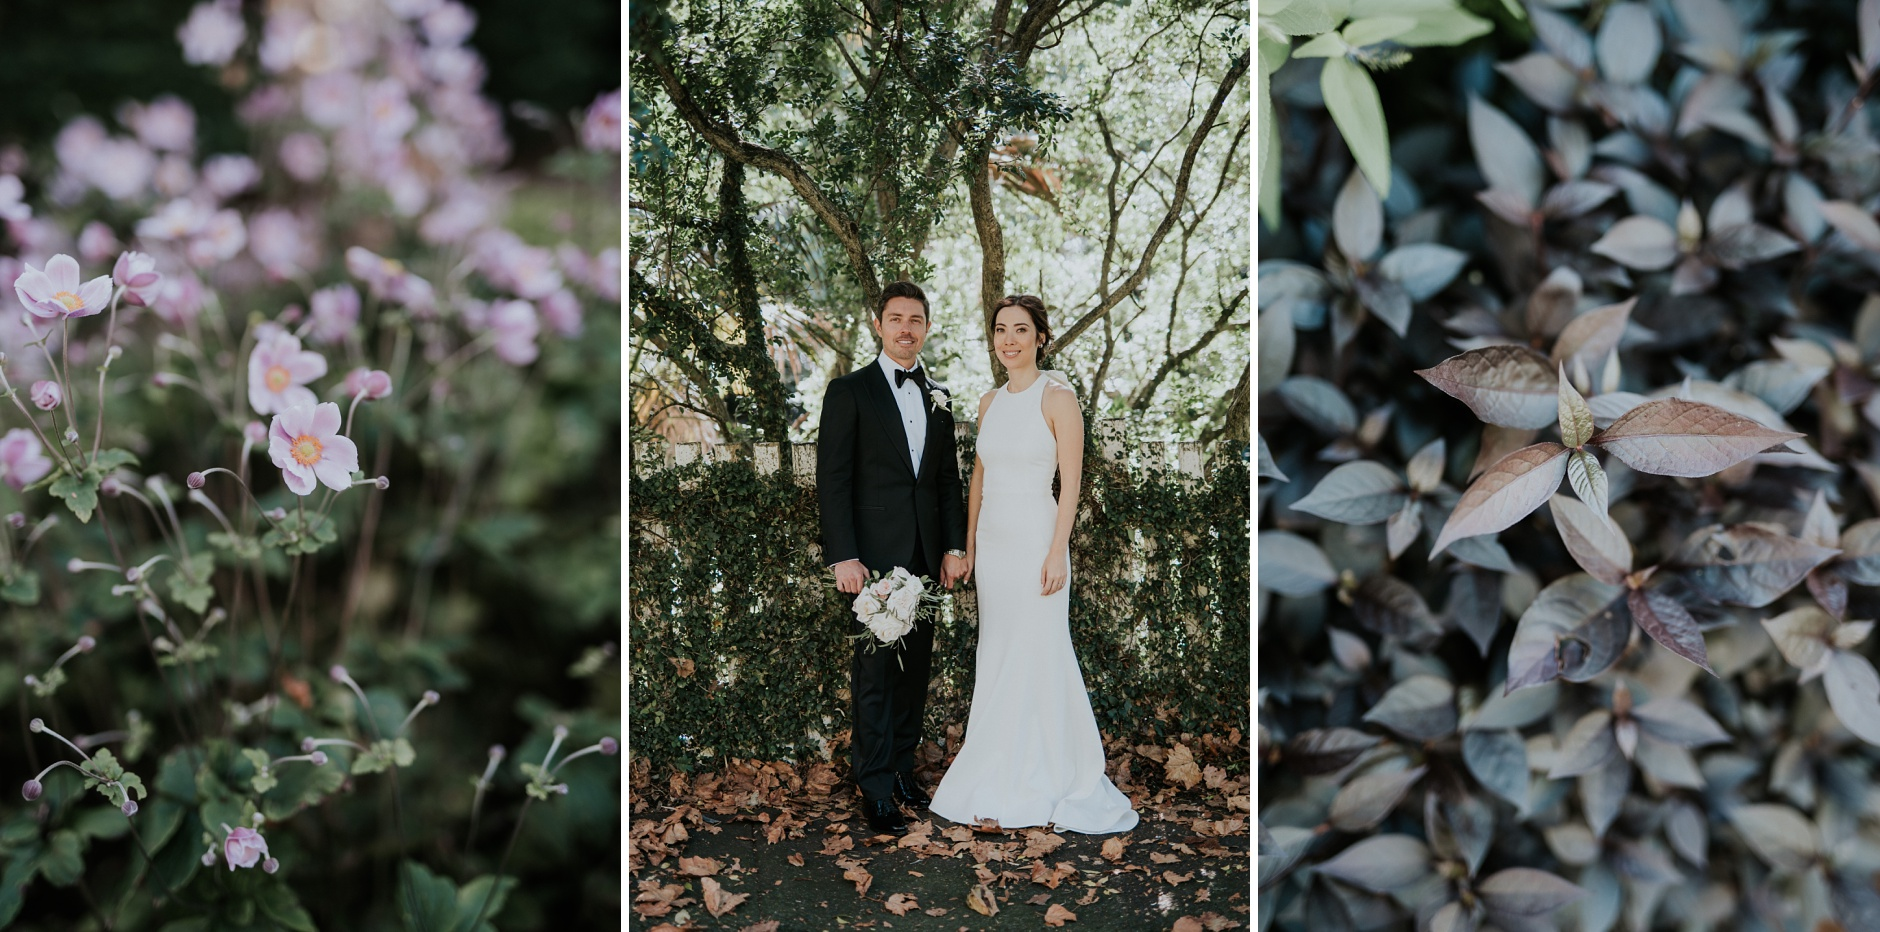 Sydney-Wedding-Photographer_0027bb.jpg